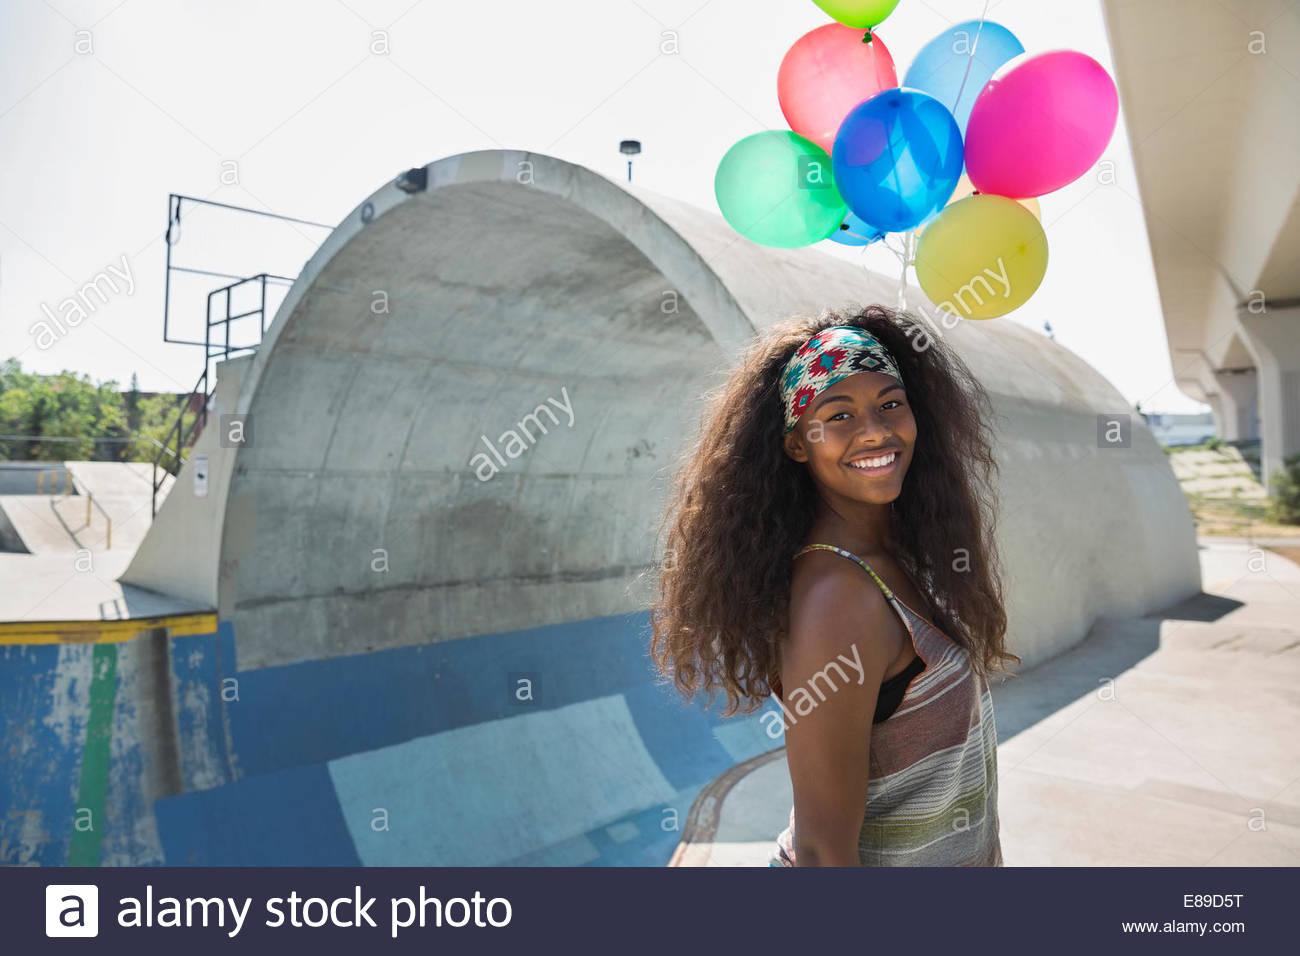 Teenage girl with balloons at skateboard park - Stock Image